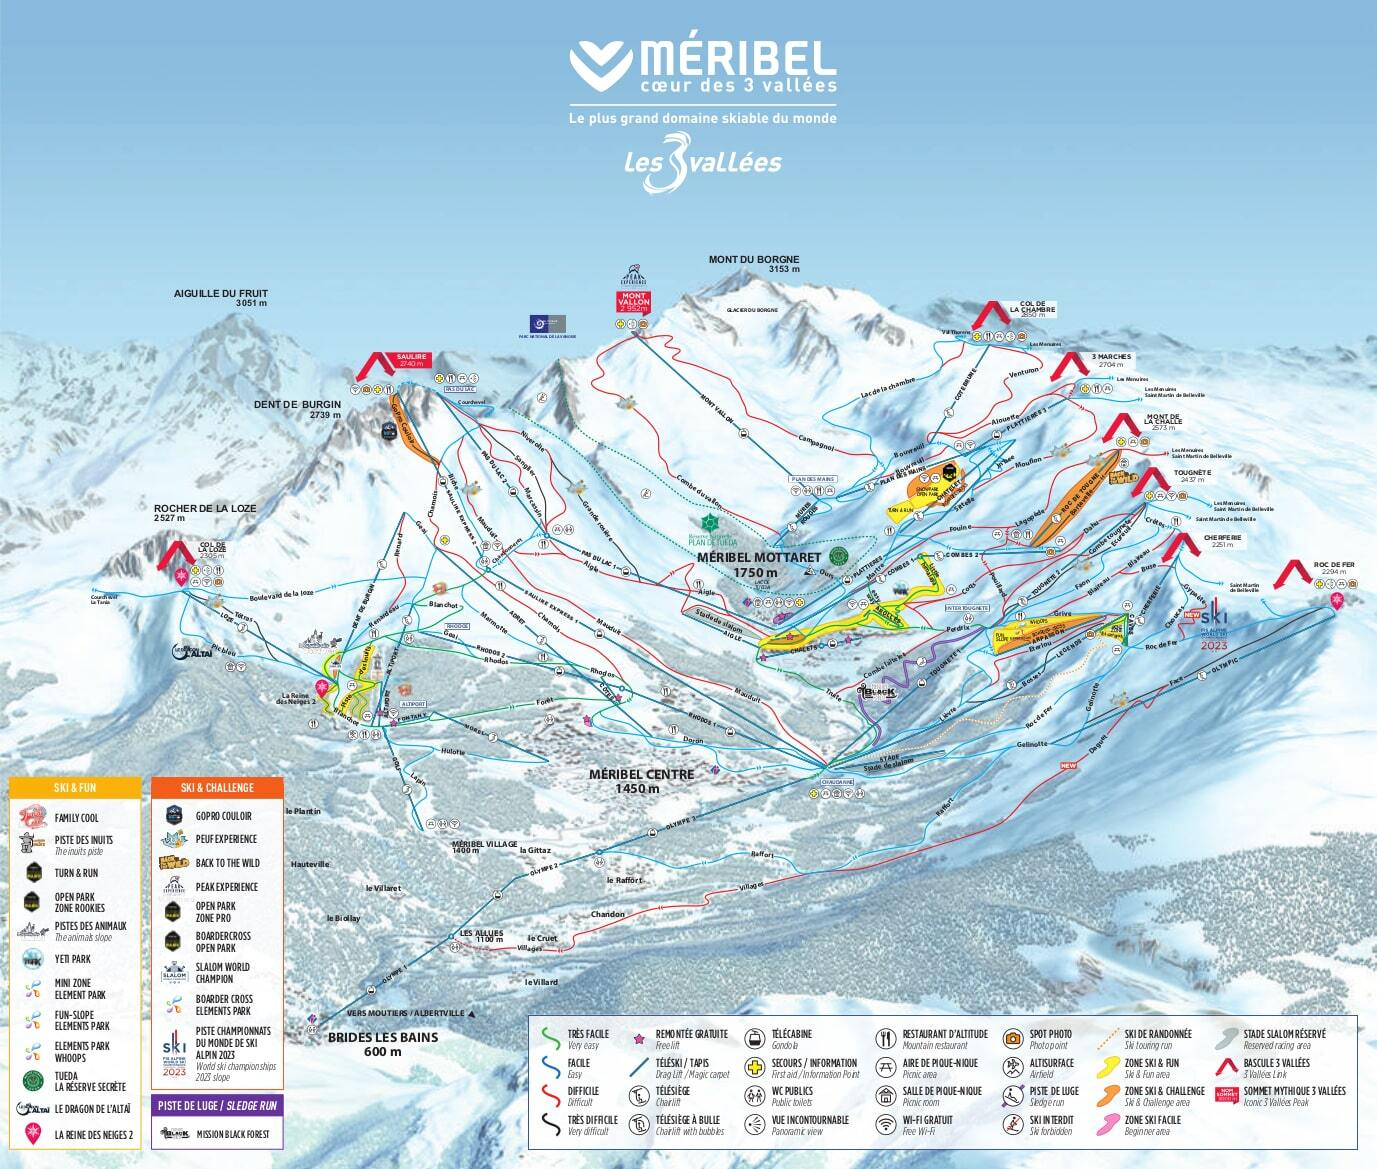 Meribel Travel Guide